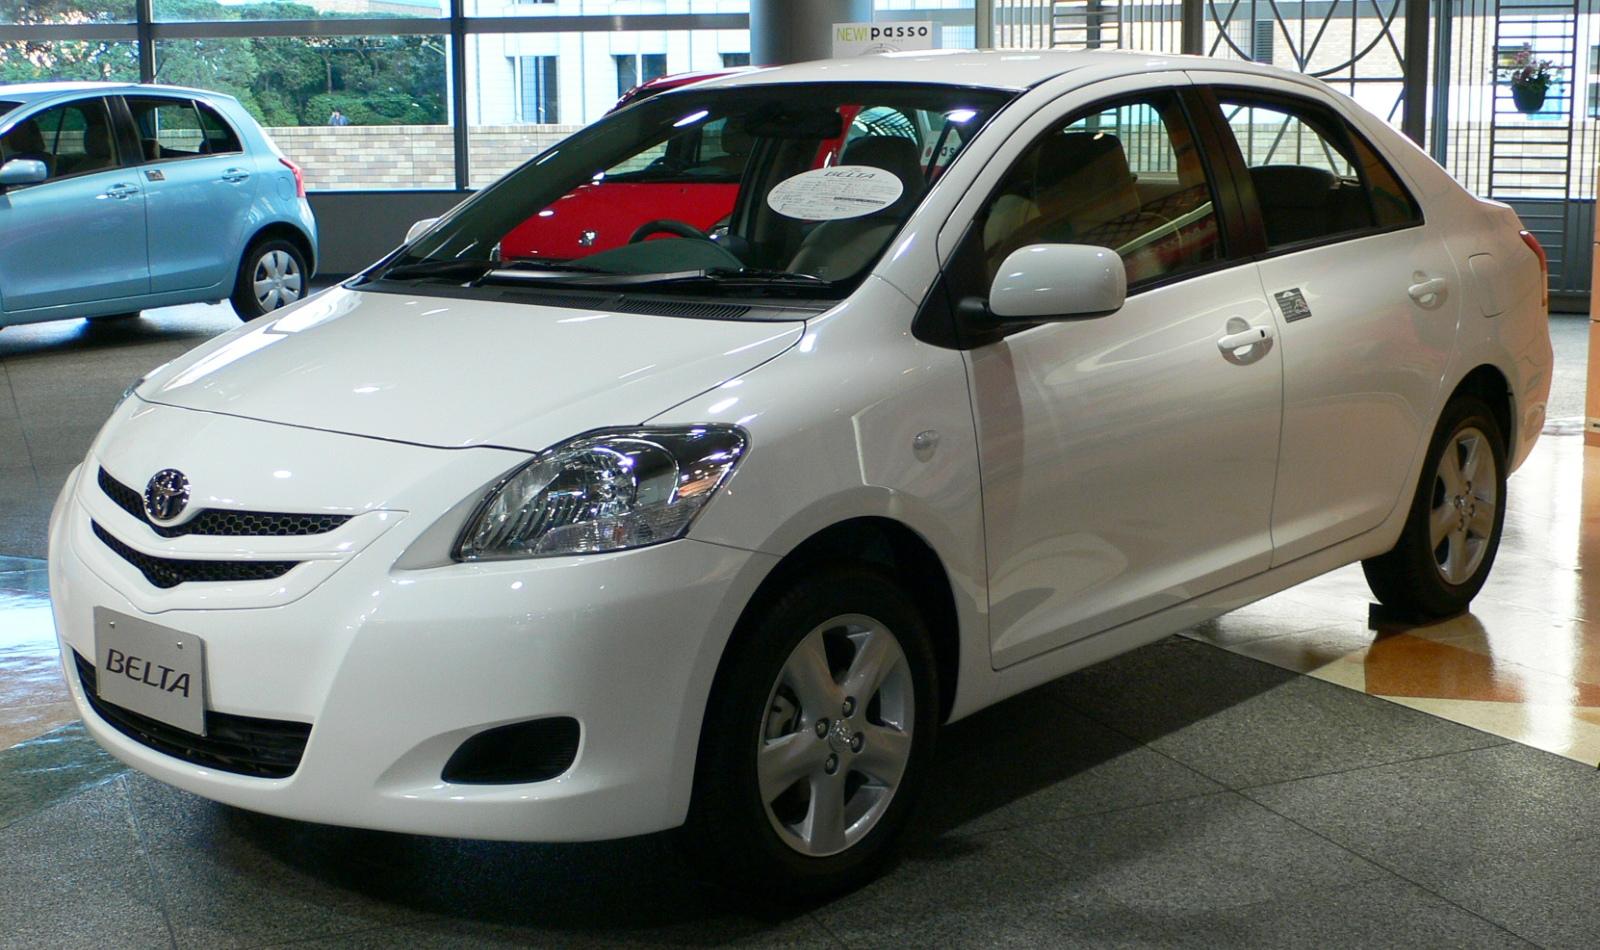 2005_Toyota_Belta_01.jpg